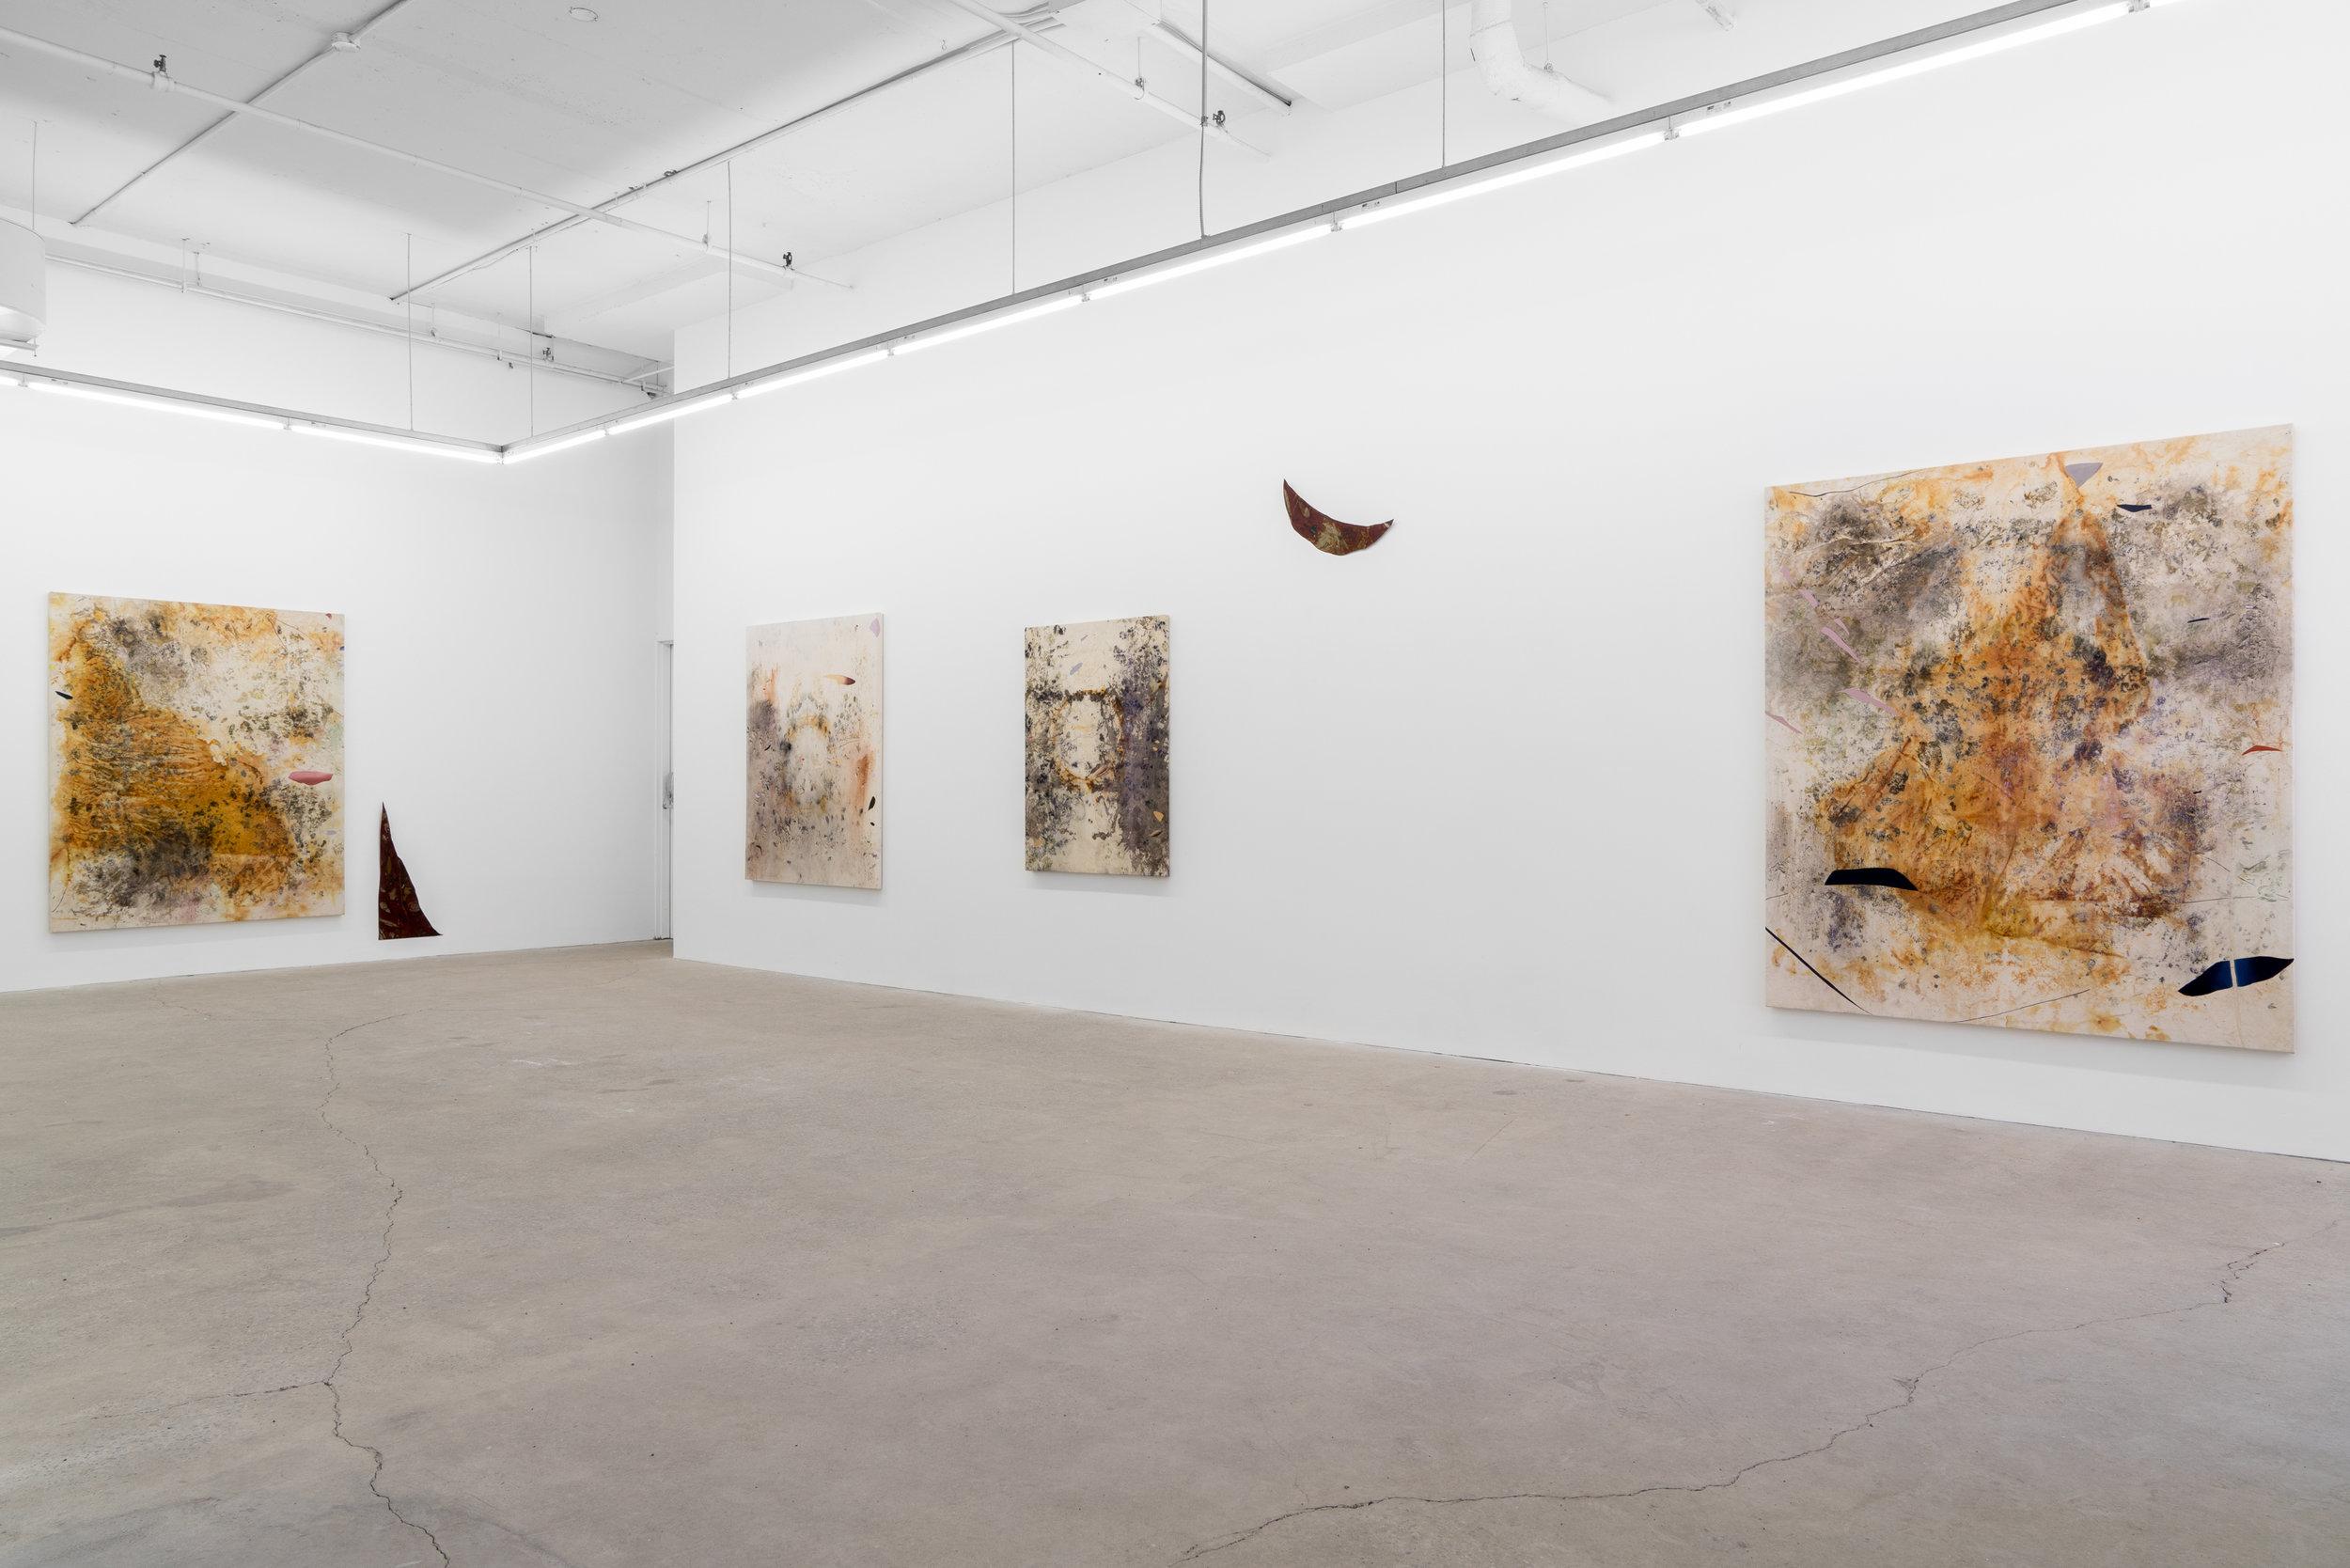 Gillian King,  Sediment , 2019, exhibition view, Galerie Nicolas Robert, photo : Jean-Michael Séminaro